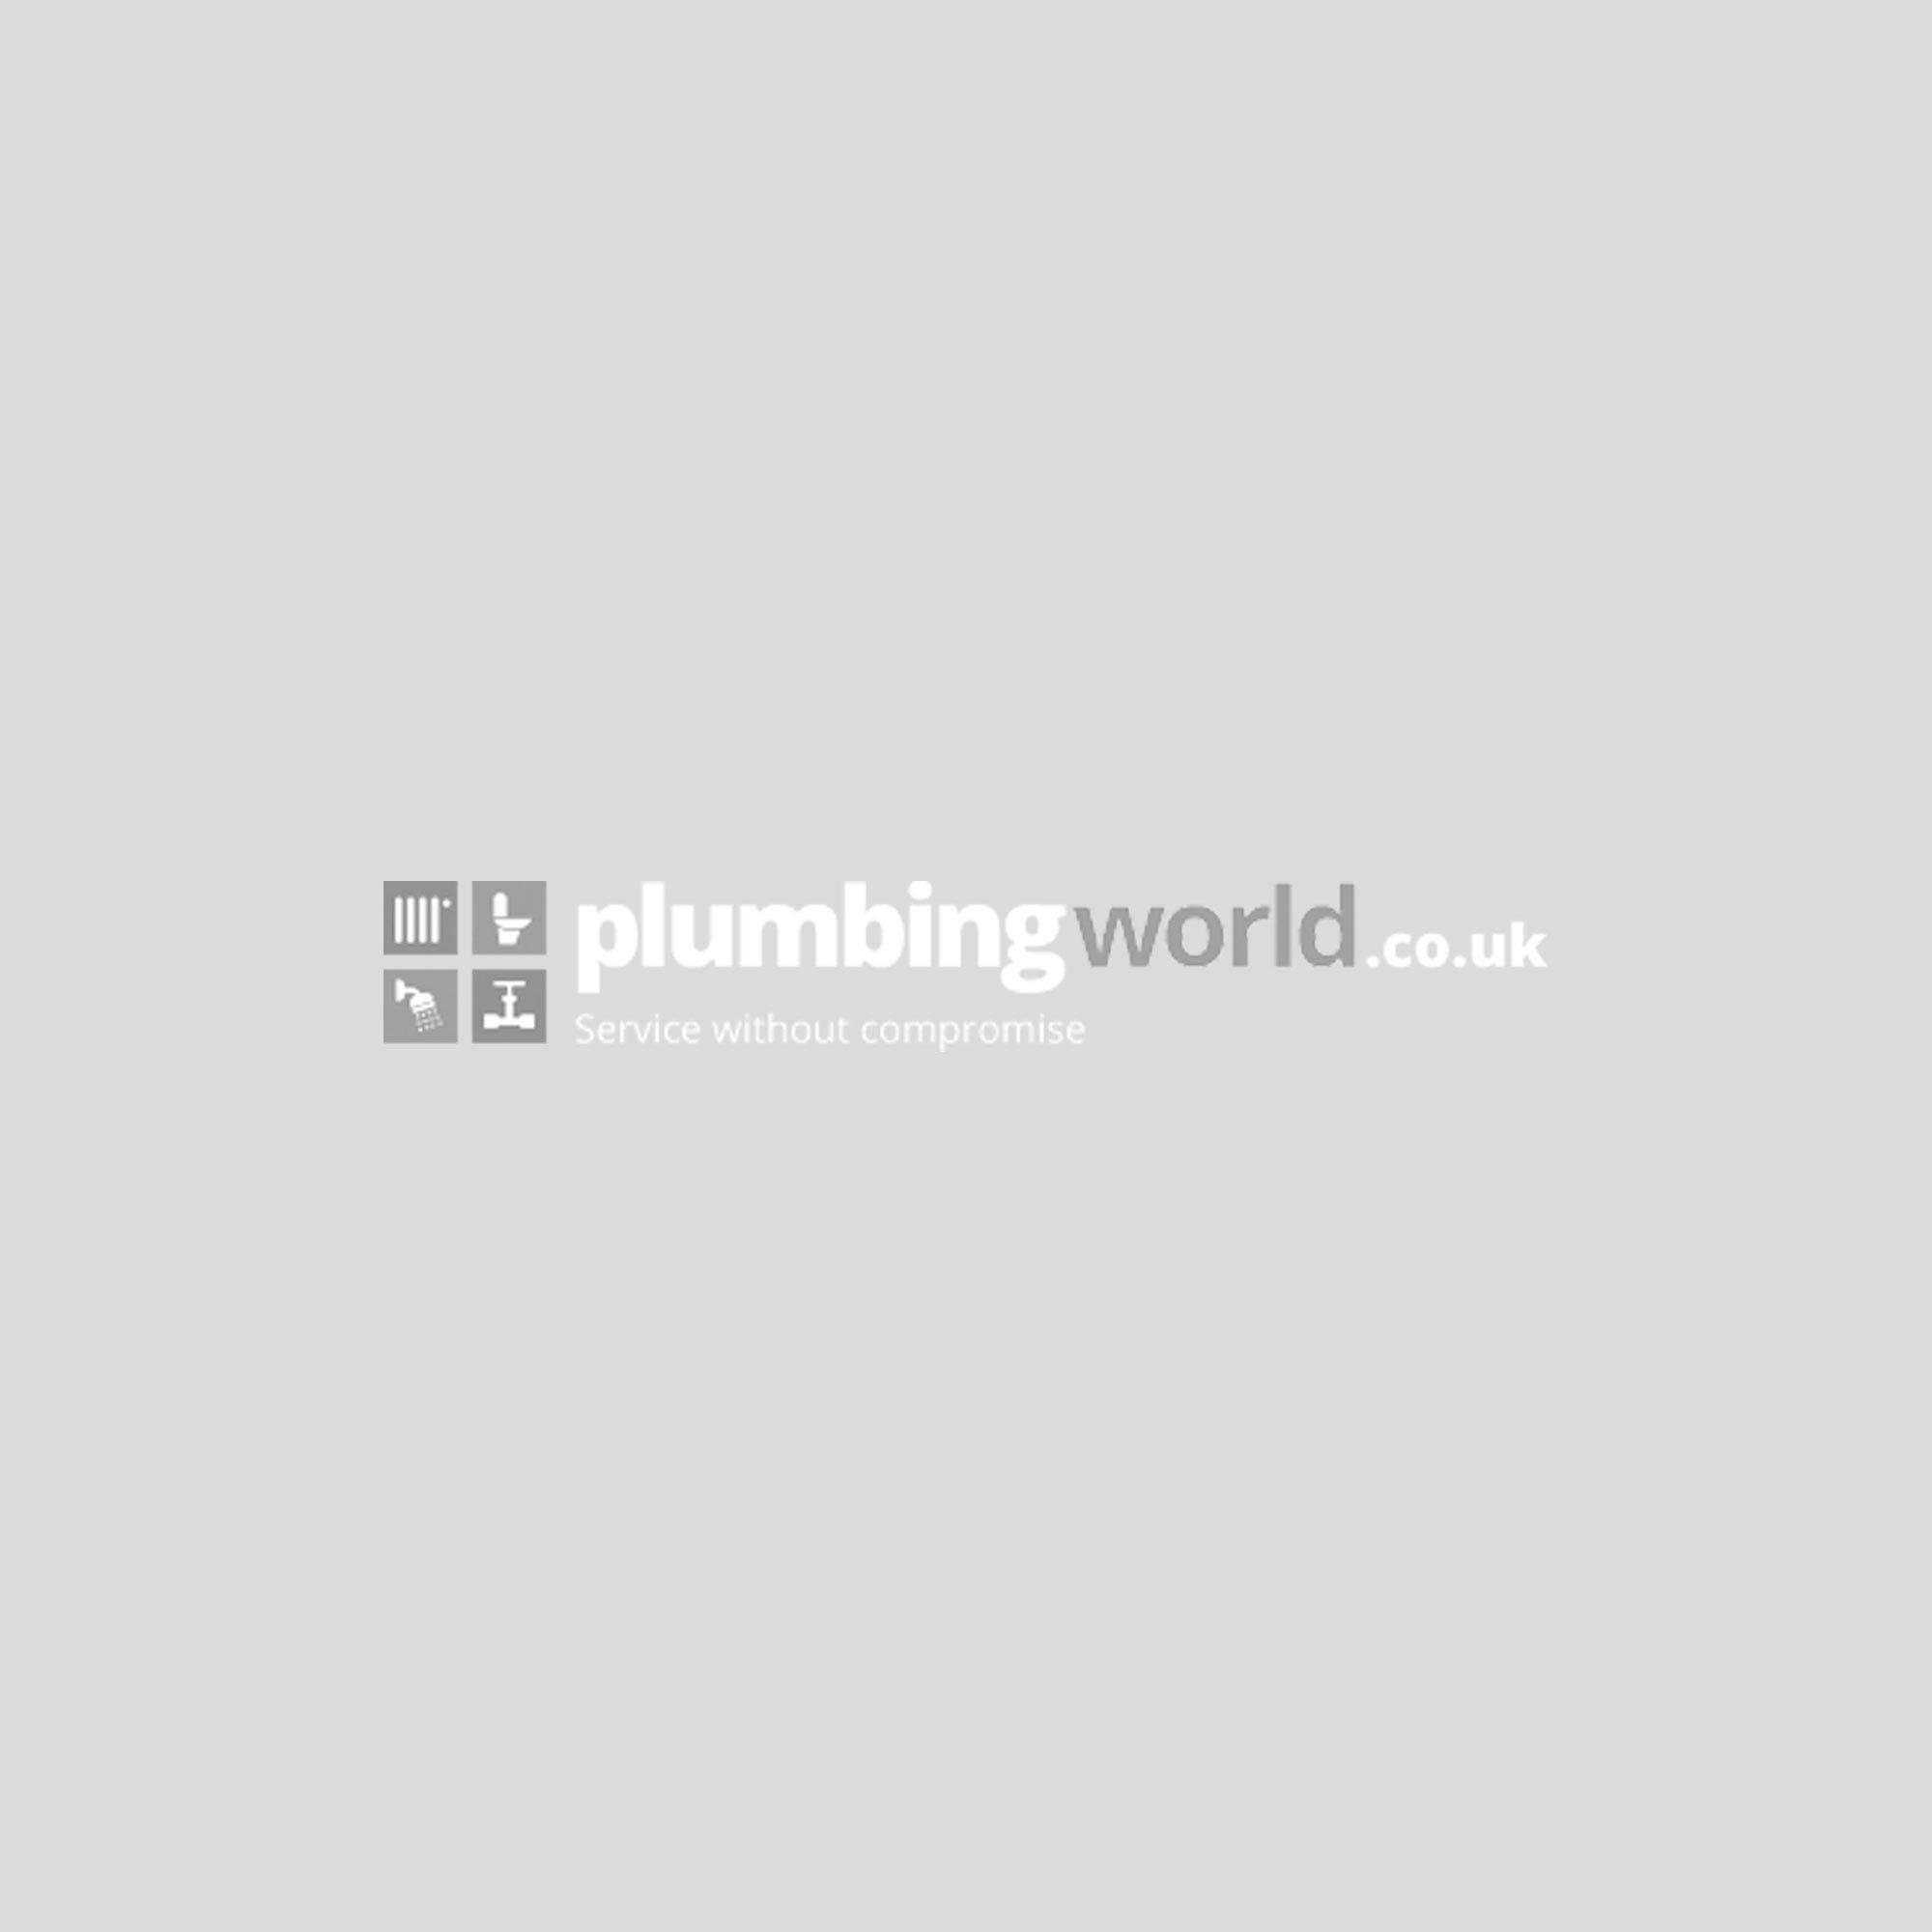 Kartell Koncept Double Sliding Door Quadrant Shower Enclosure 800mm x 800mm